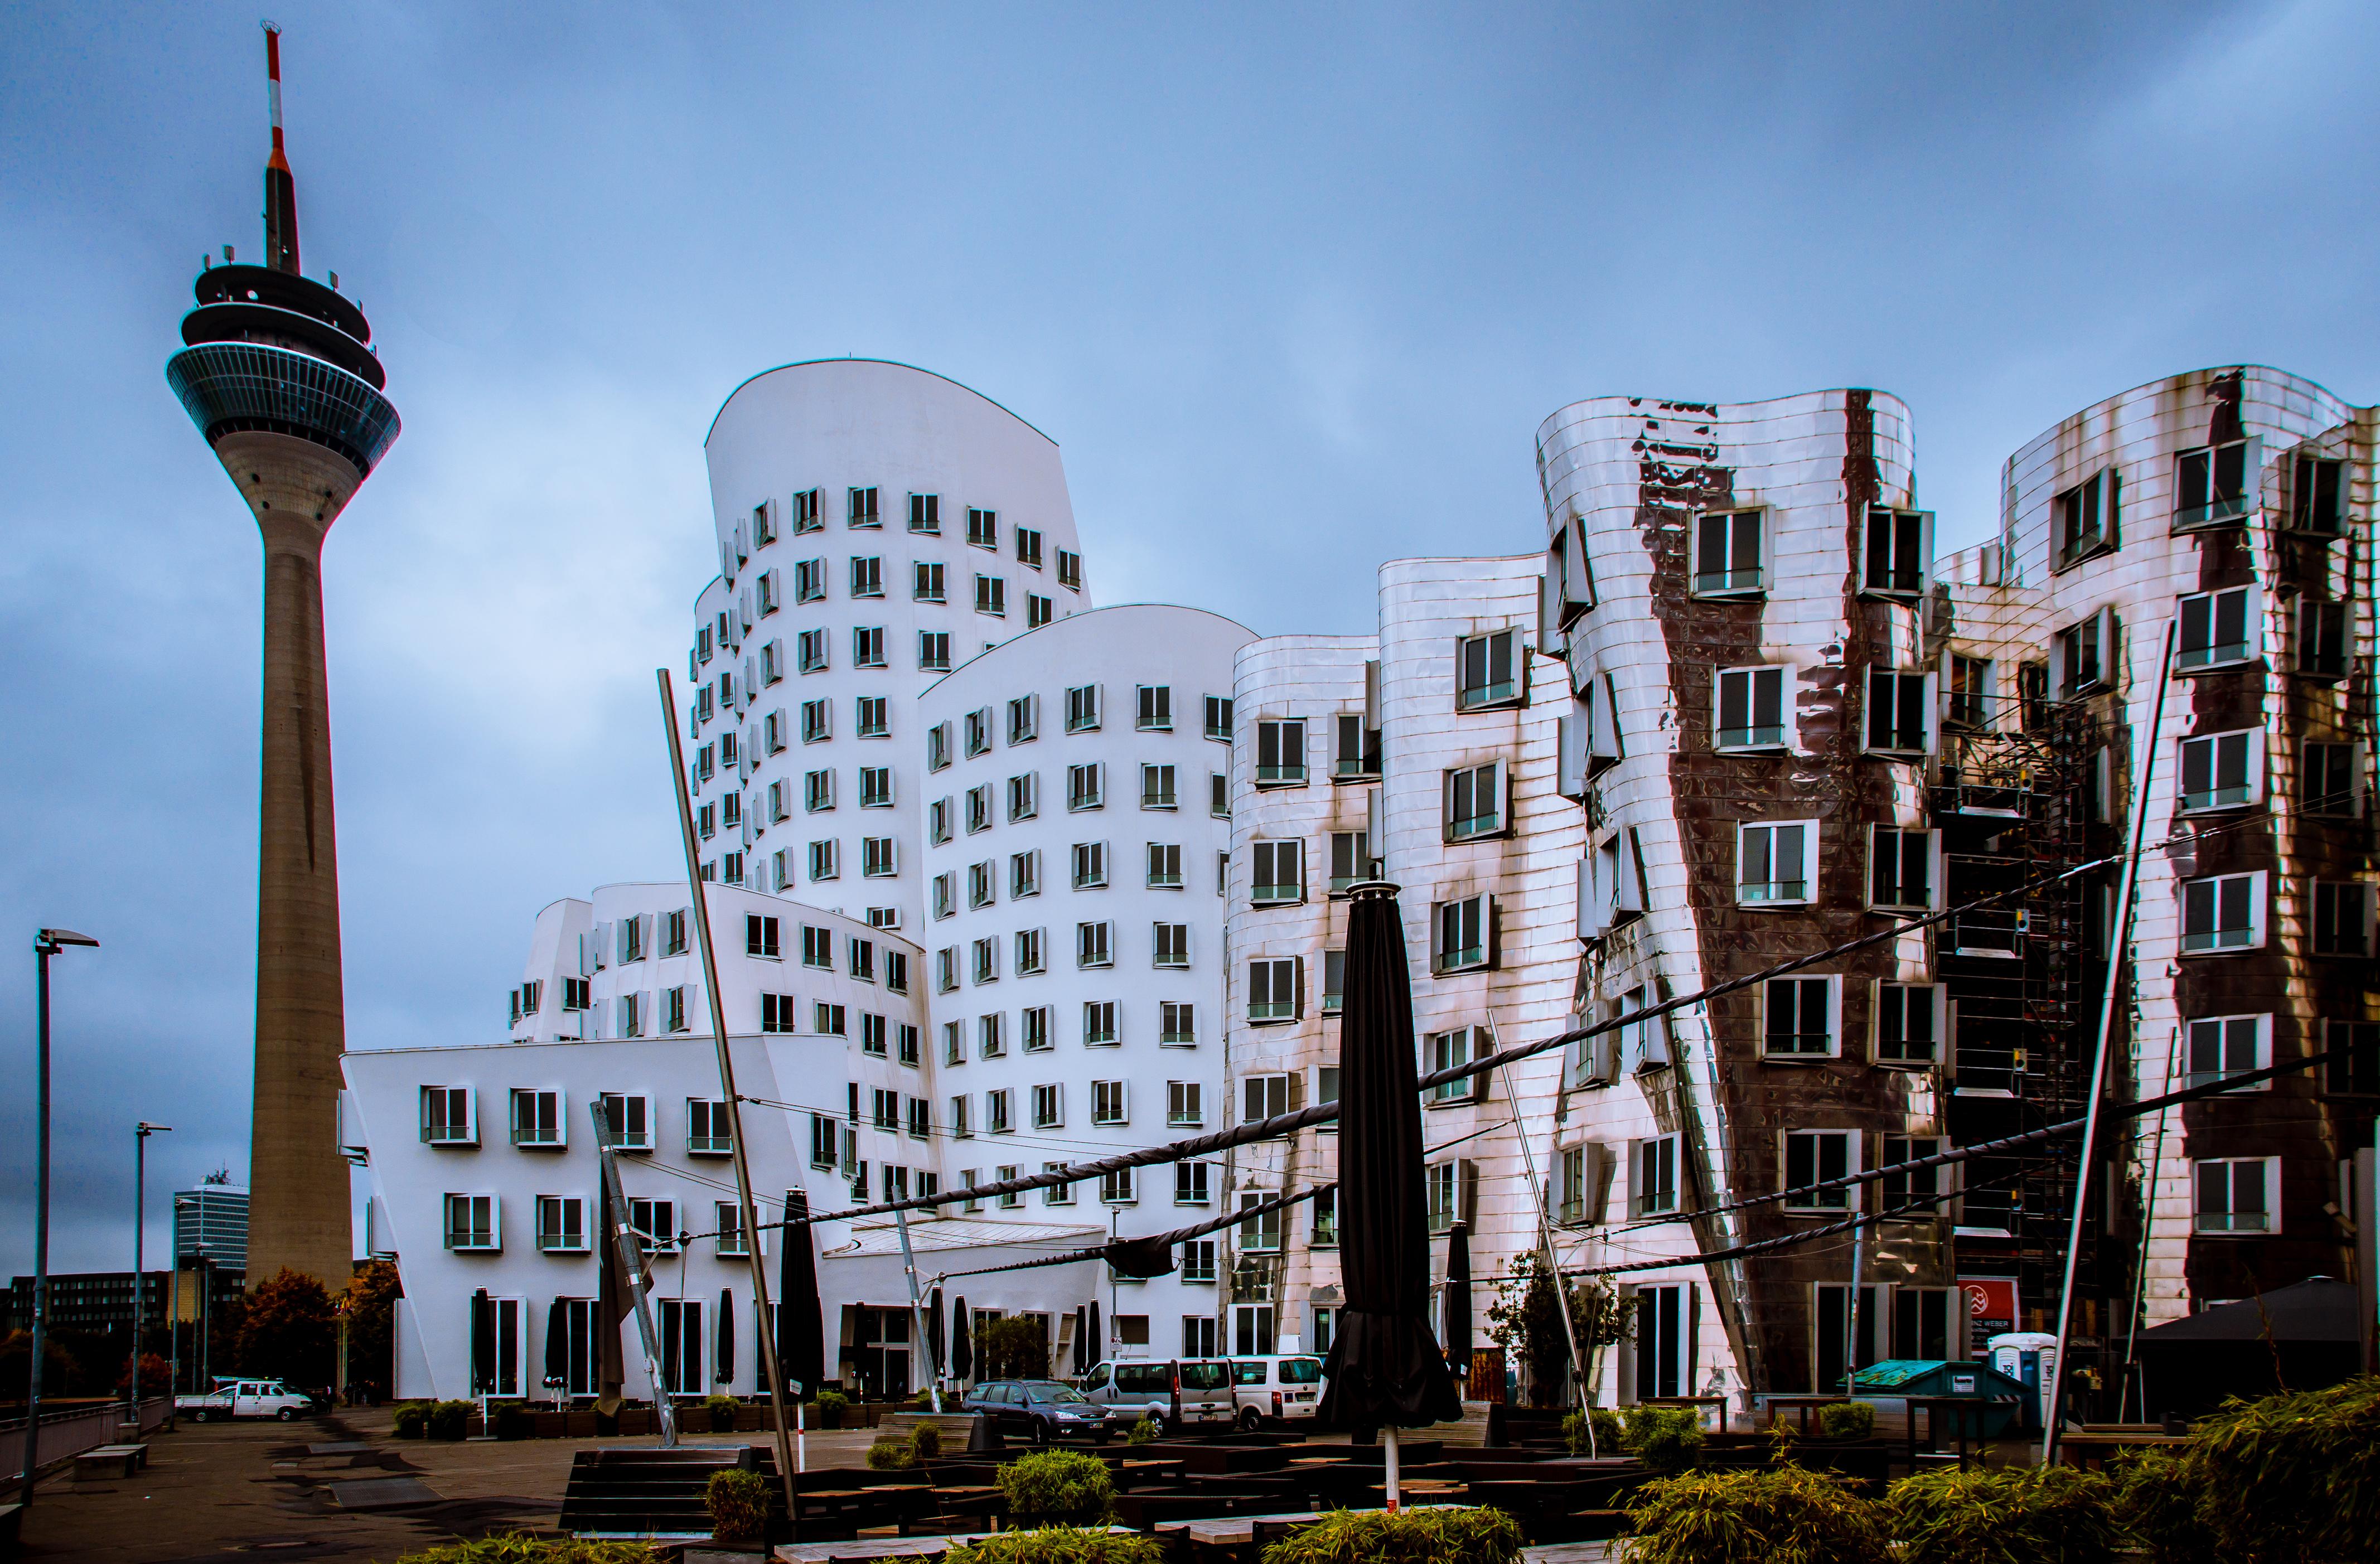 datei d sseldorf medienhafen neuer zollhof office buildings river bank fa ade 10511527744. Black Bedroom Furniture Sets. Home Design Ideas